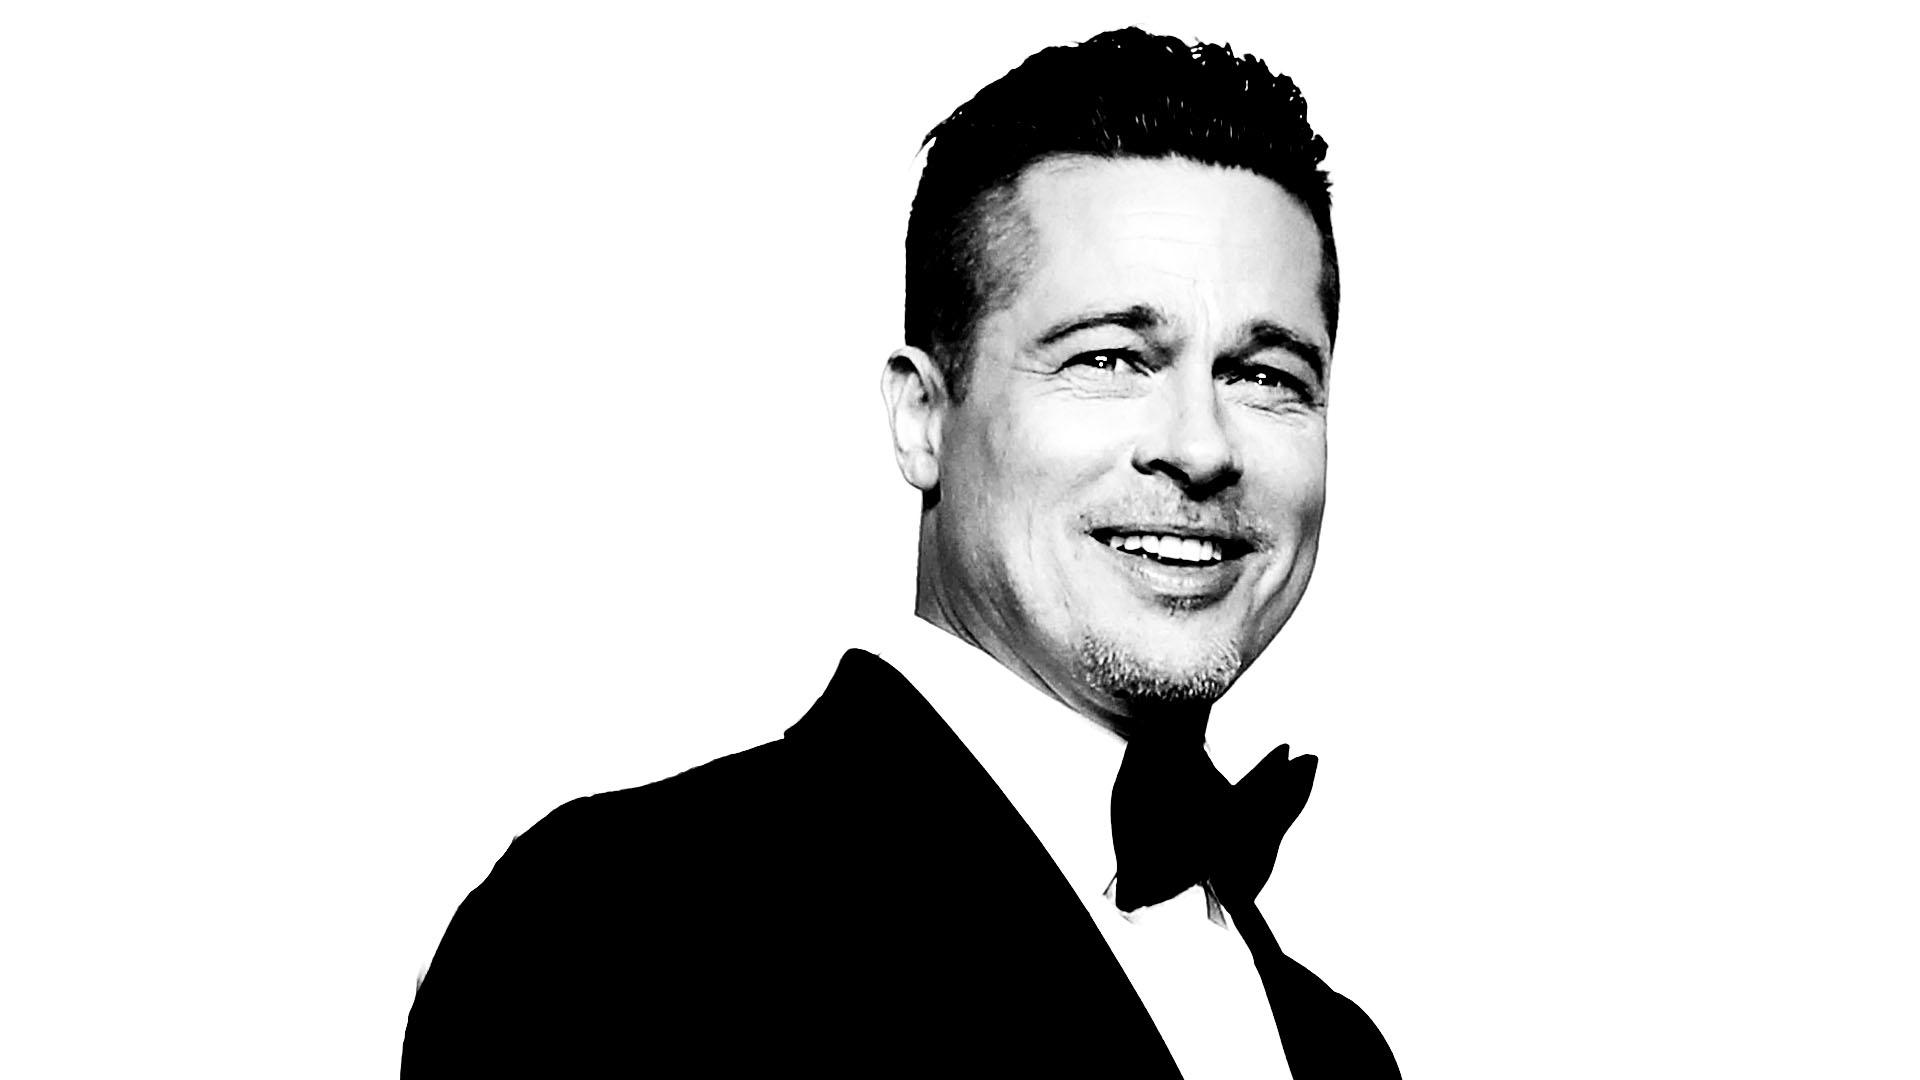 Brad-Pitt-Background-wallpaper-hd-10